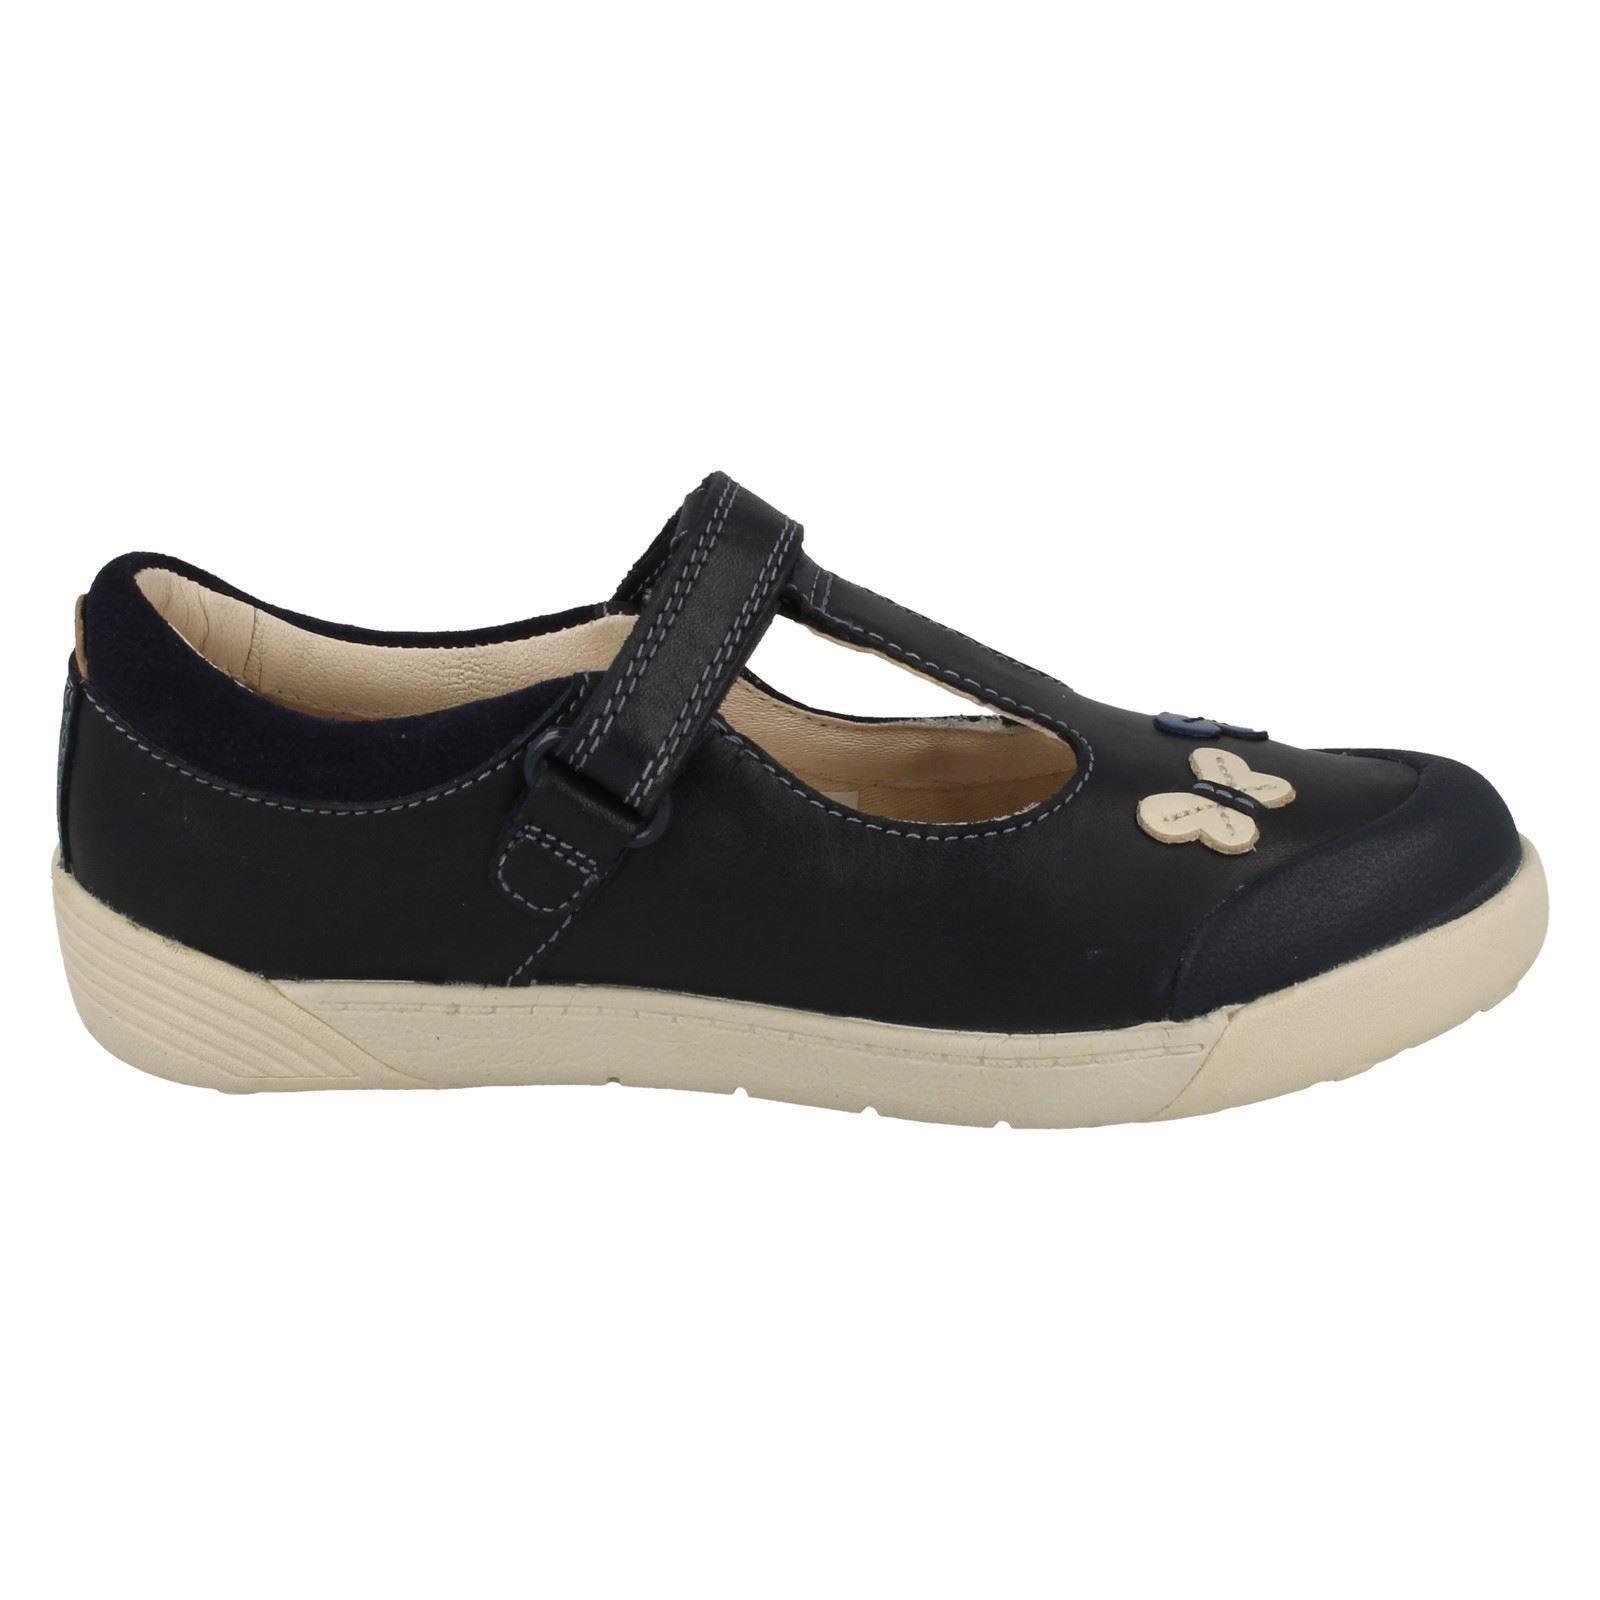 Girls Clarks Lil Folk Flo T-Bar Shoes